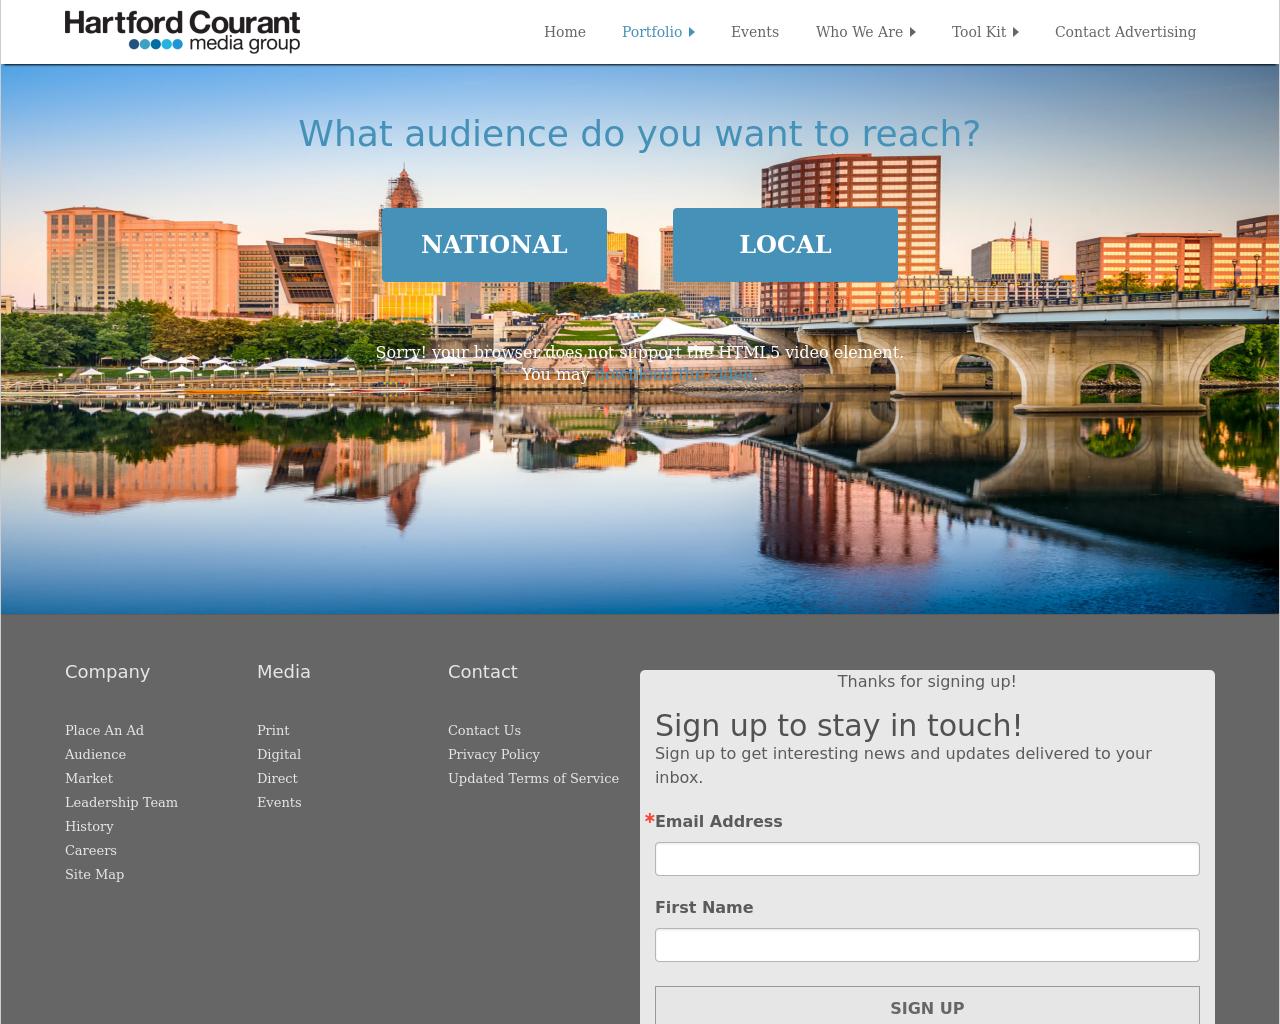 Hartford-Courant-/-CT1-Media-Advertising-Reviews-Pricing